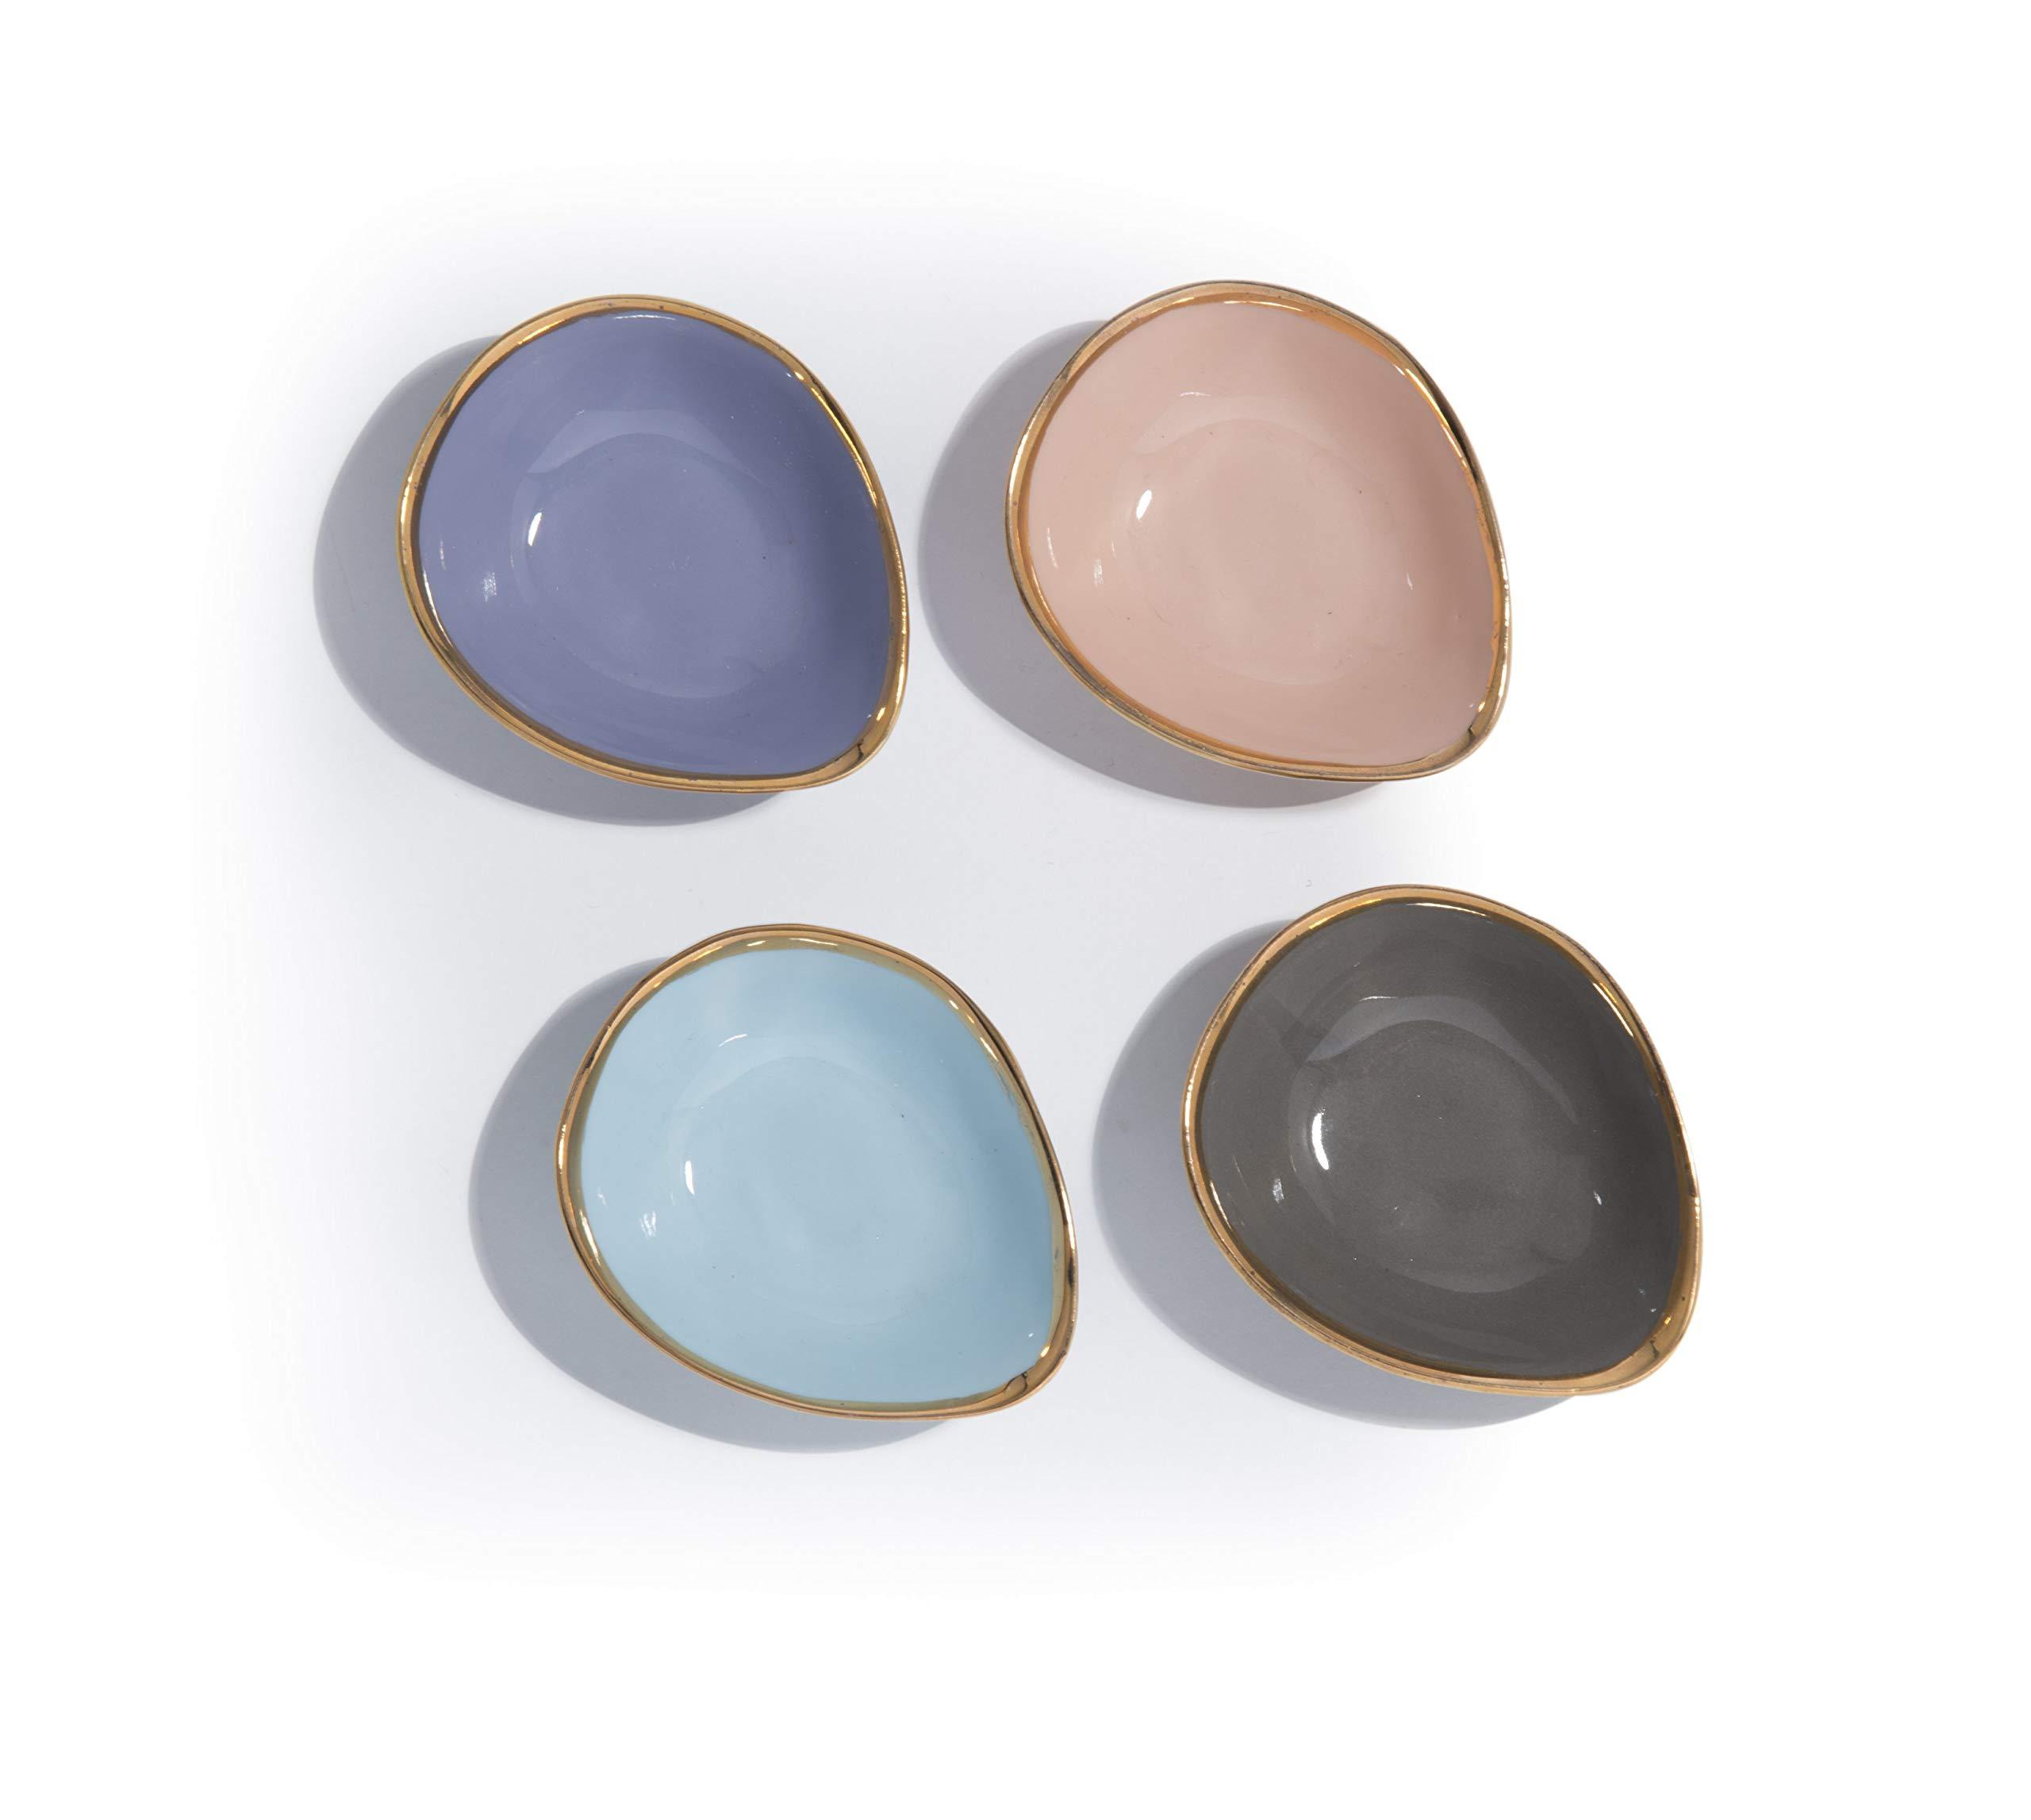 Shiraleah Home Ria Trinket Dish Set, 2 Piece